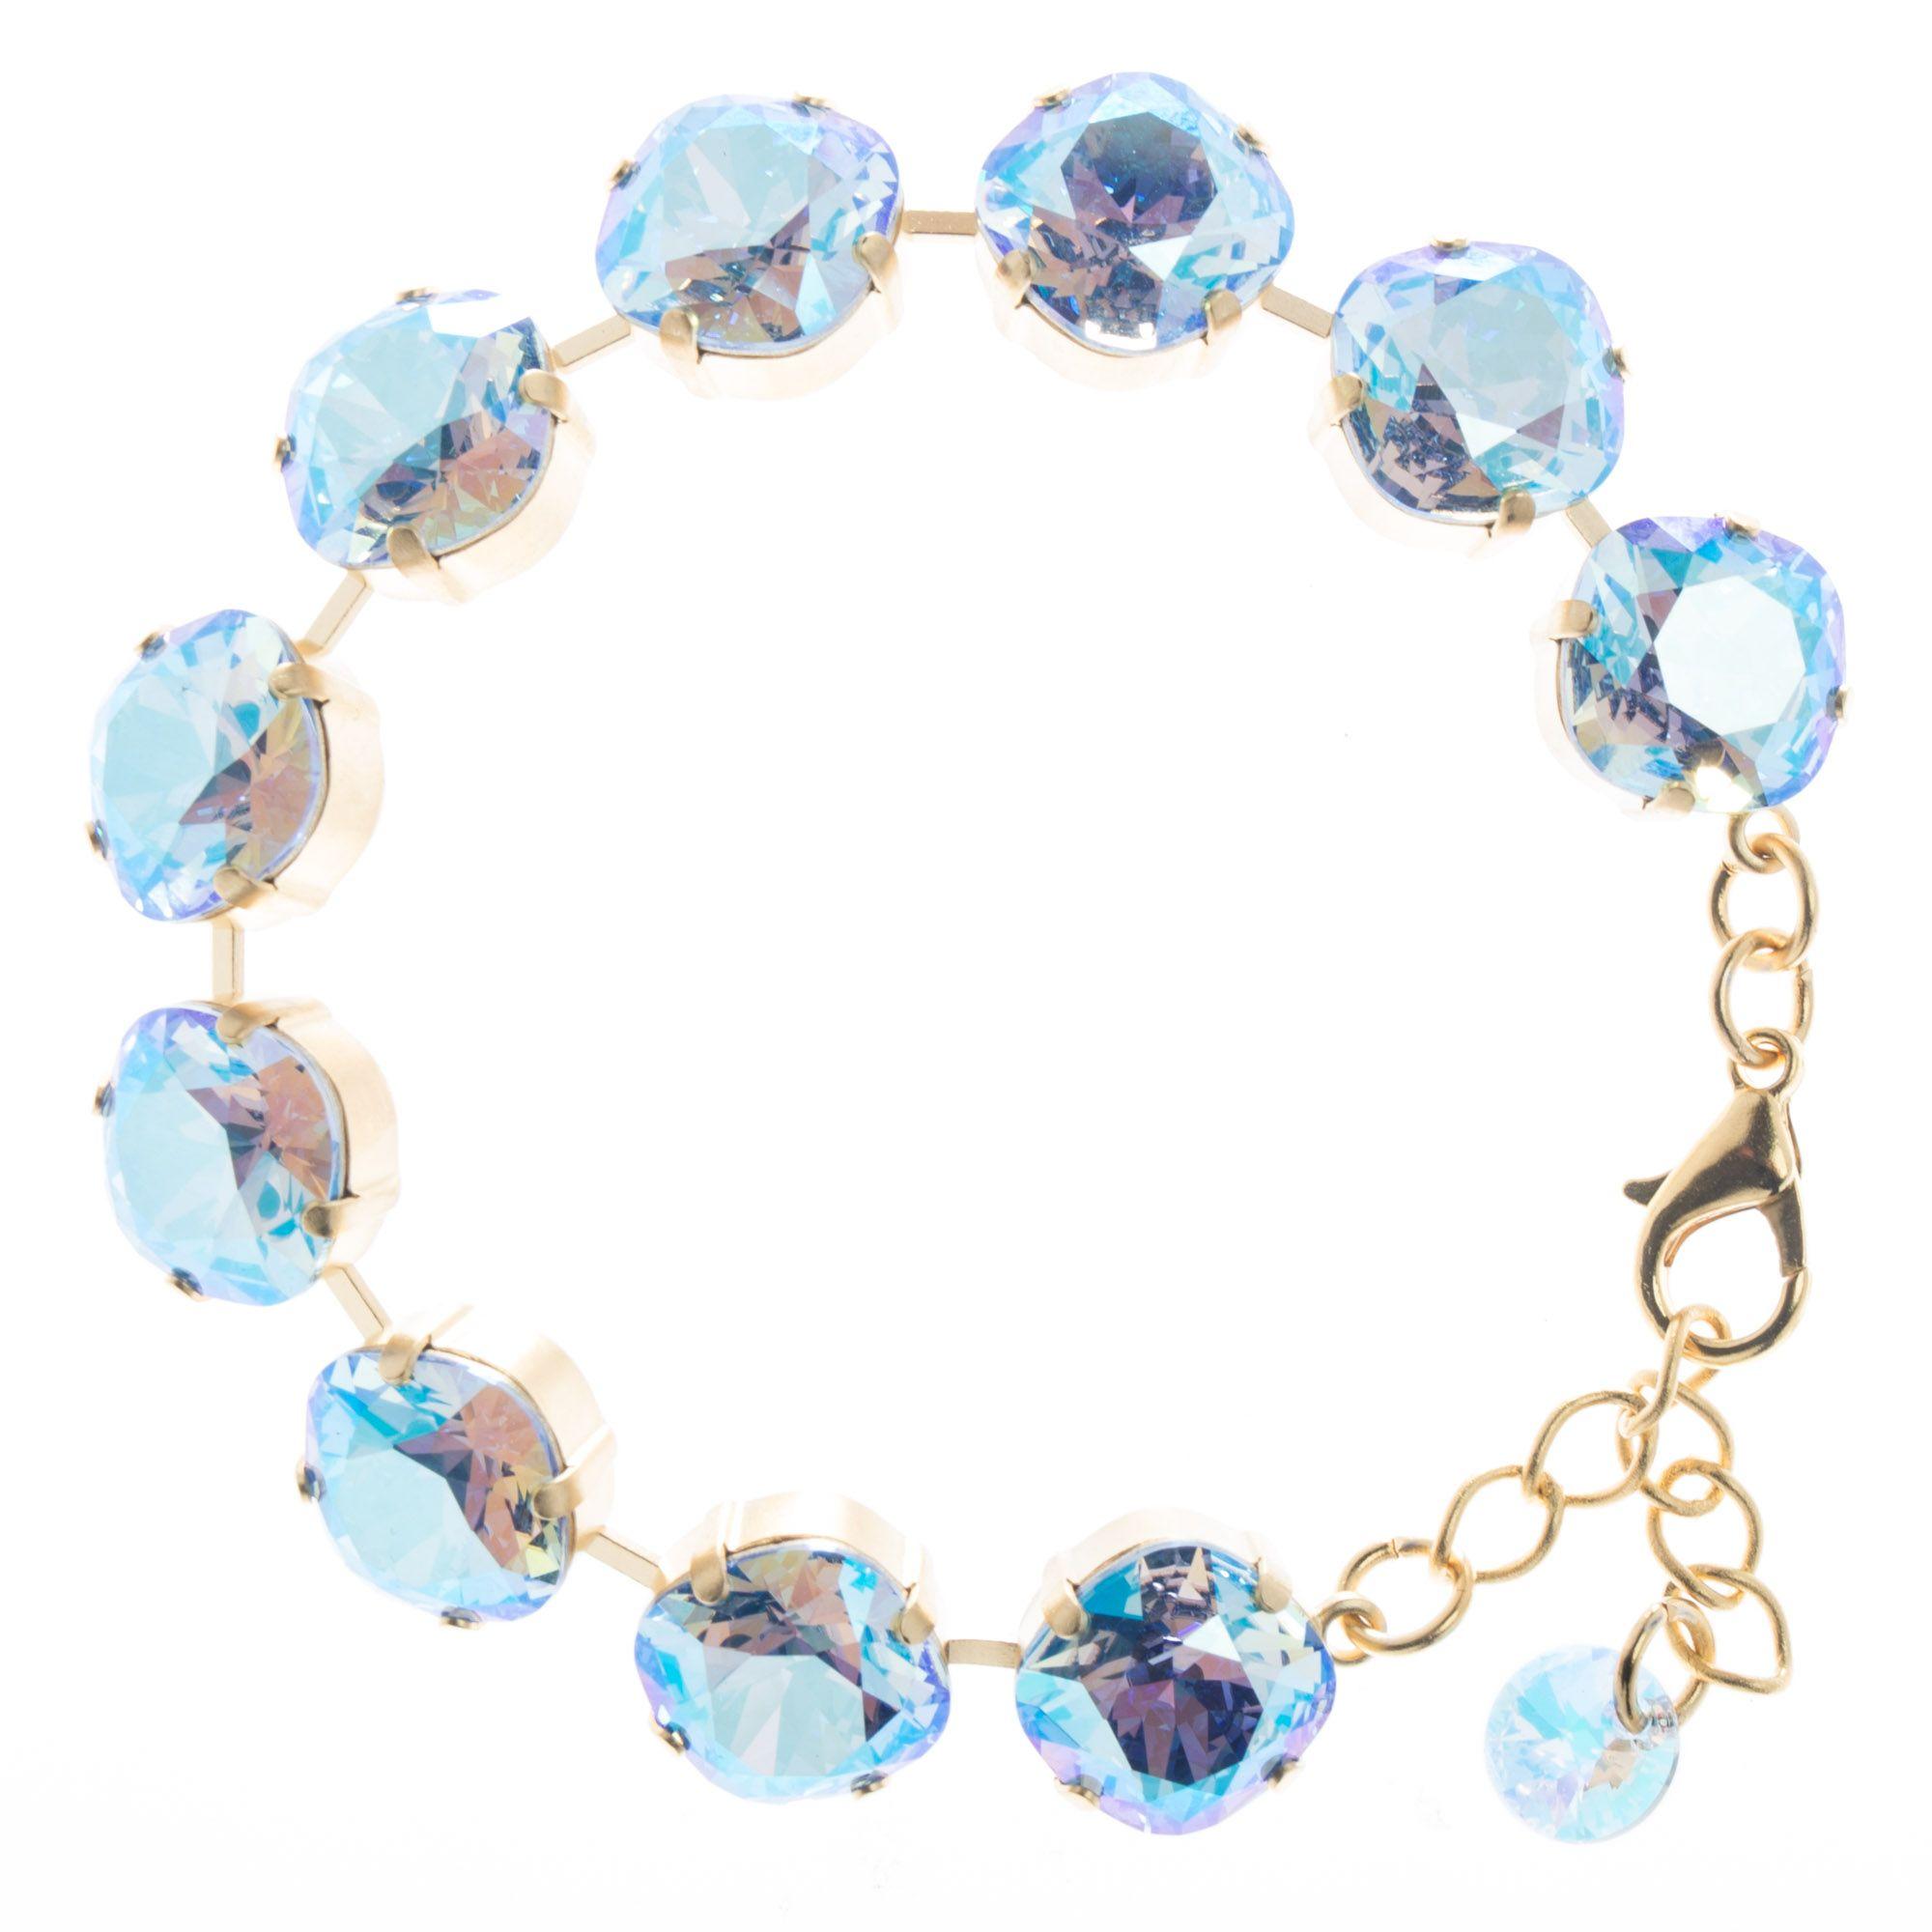 e1c804dbd00875 Lisa Marie 12mm Square Swarovski Crystal Bracelet - Sapphire Shimmer. Tap  to expand